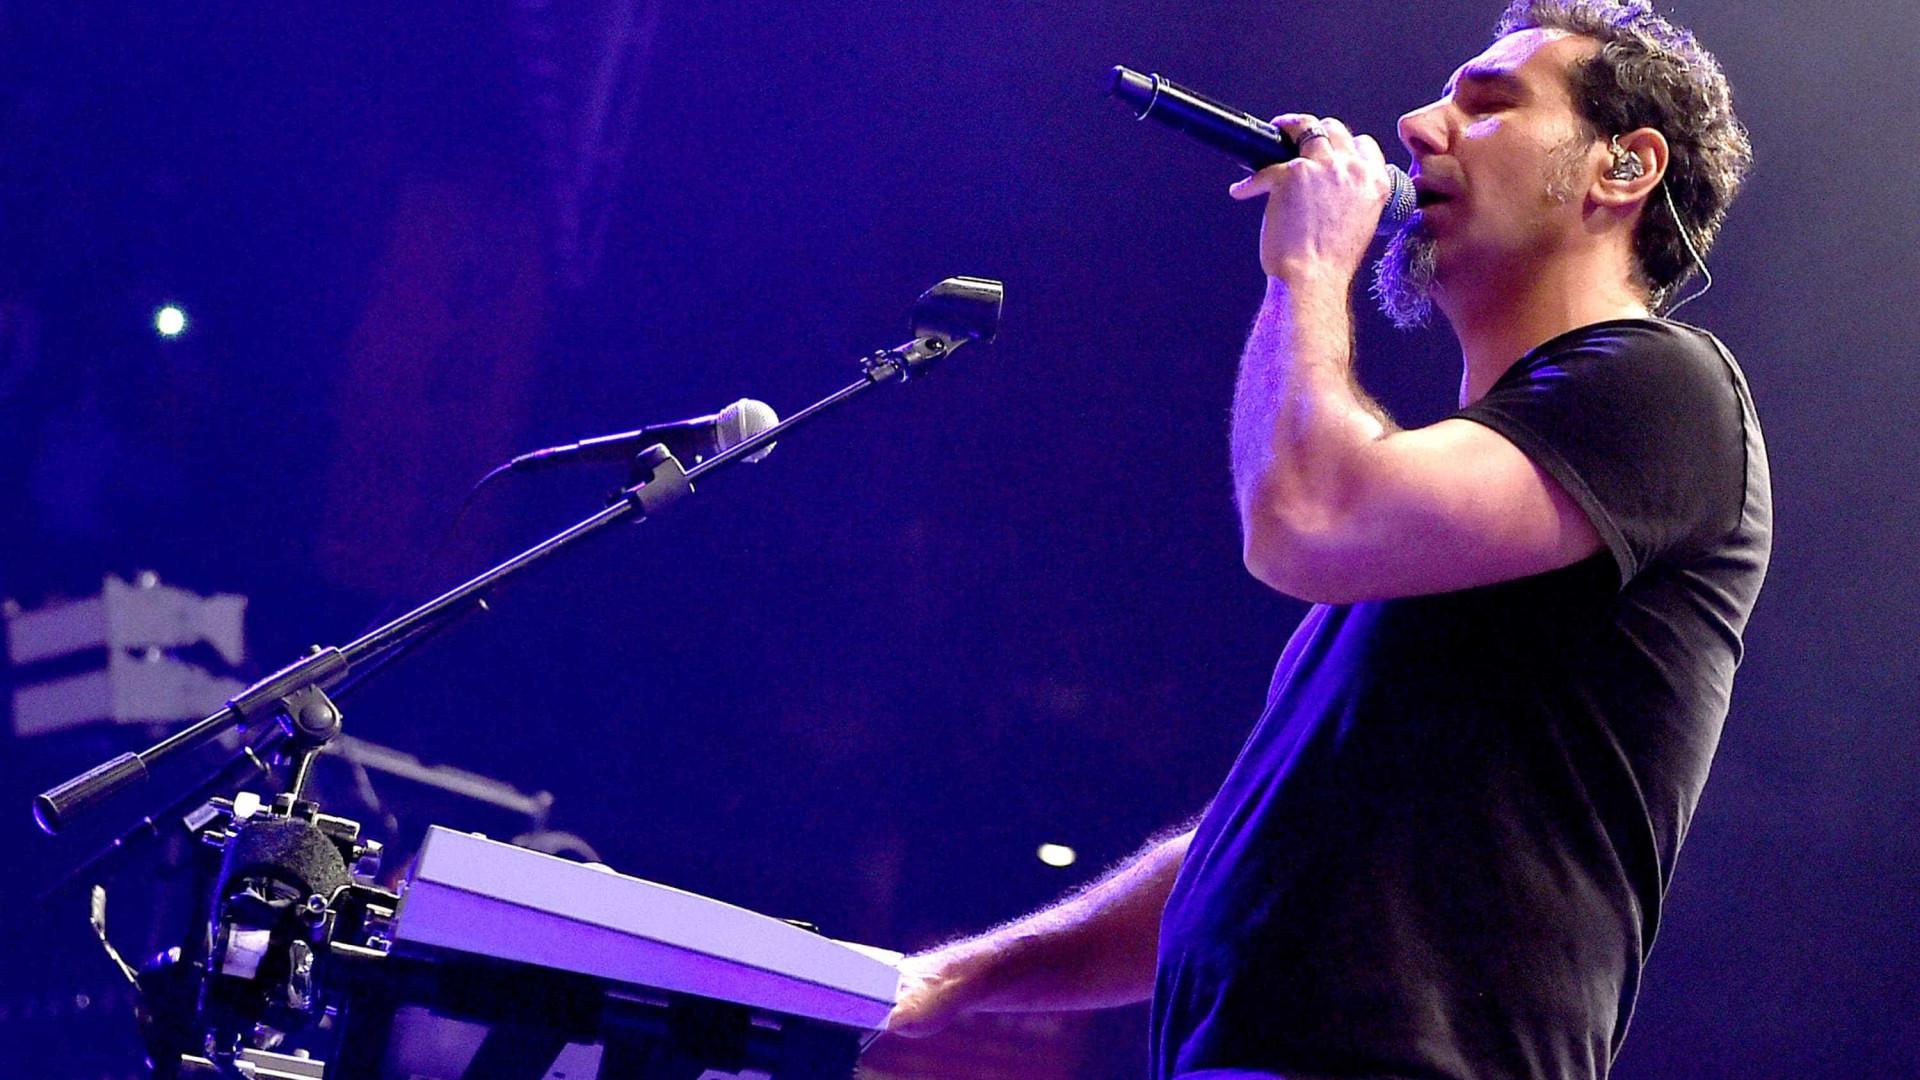 System of a Down confirmados no festival Voa Heavy Rock 2021